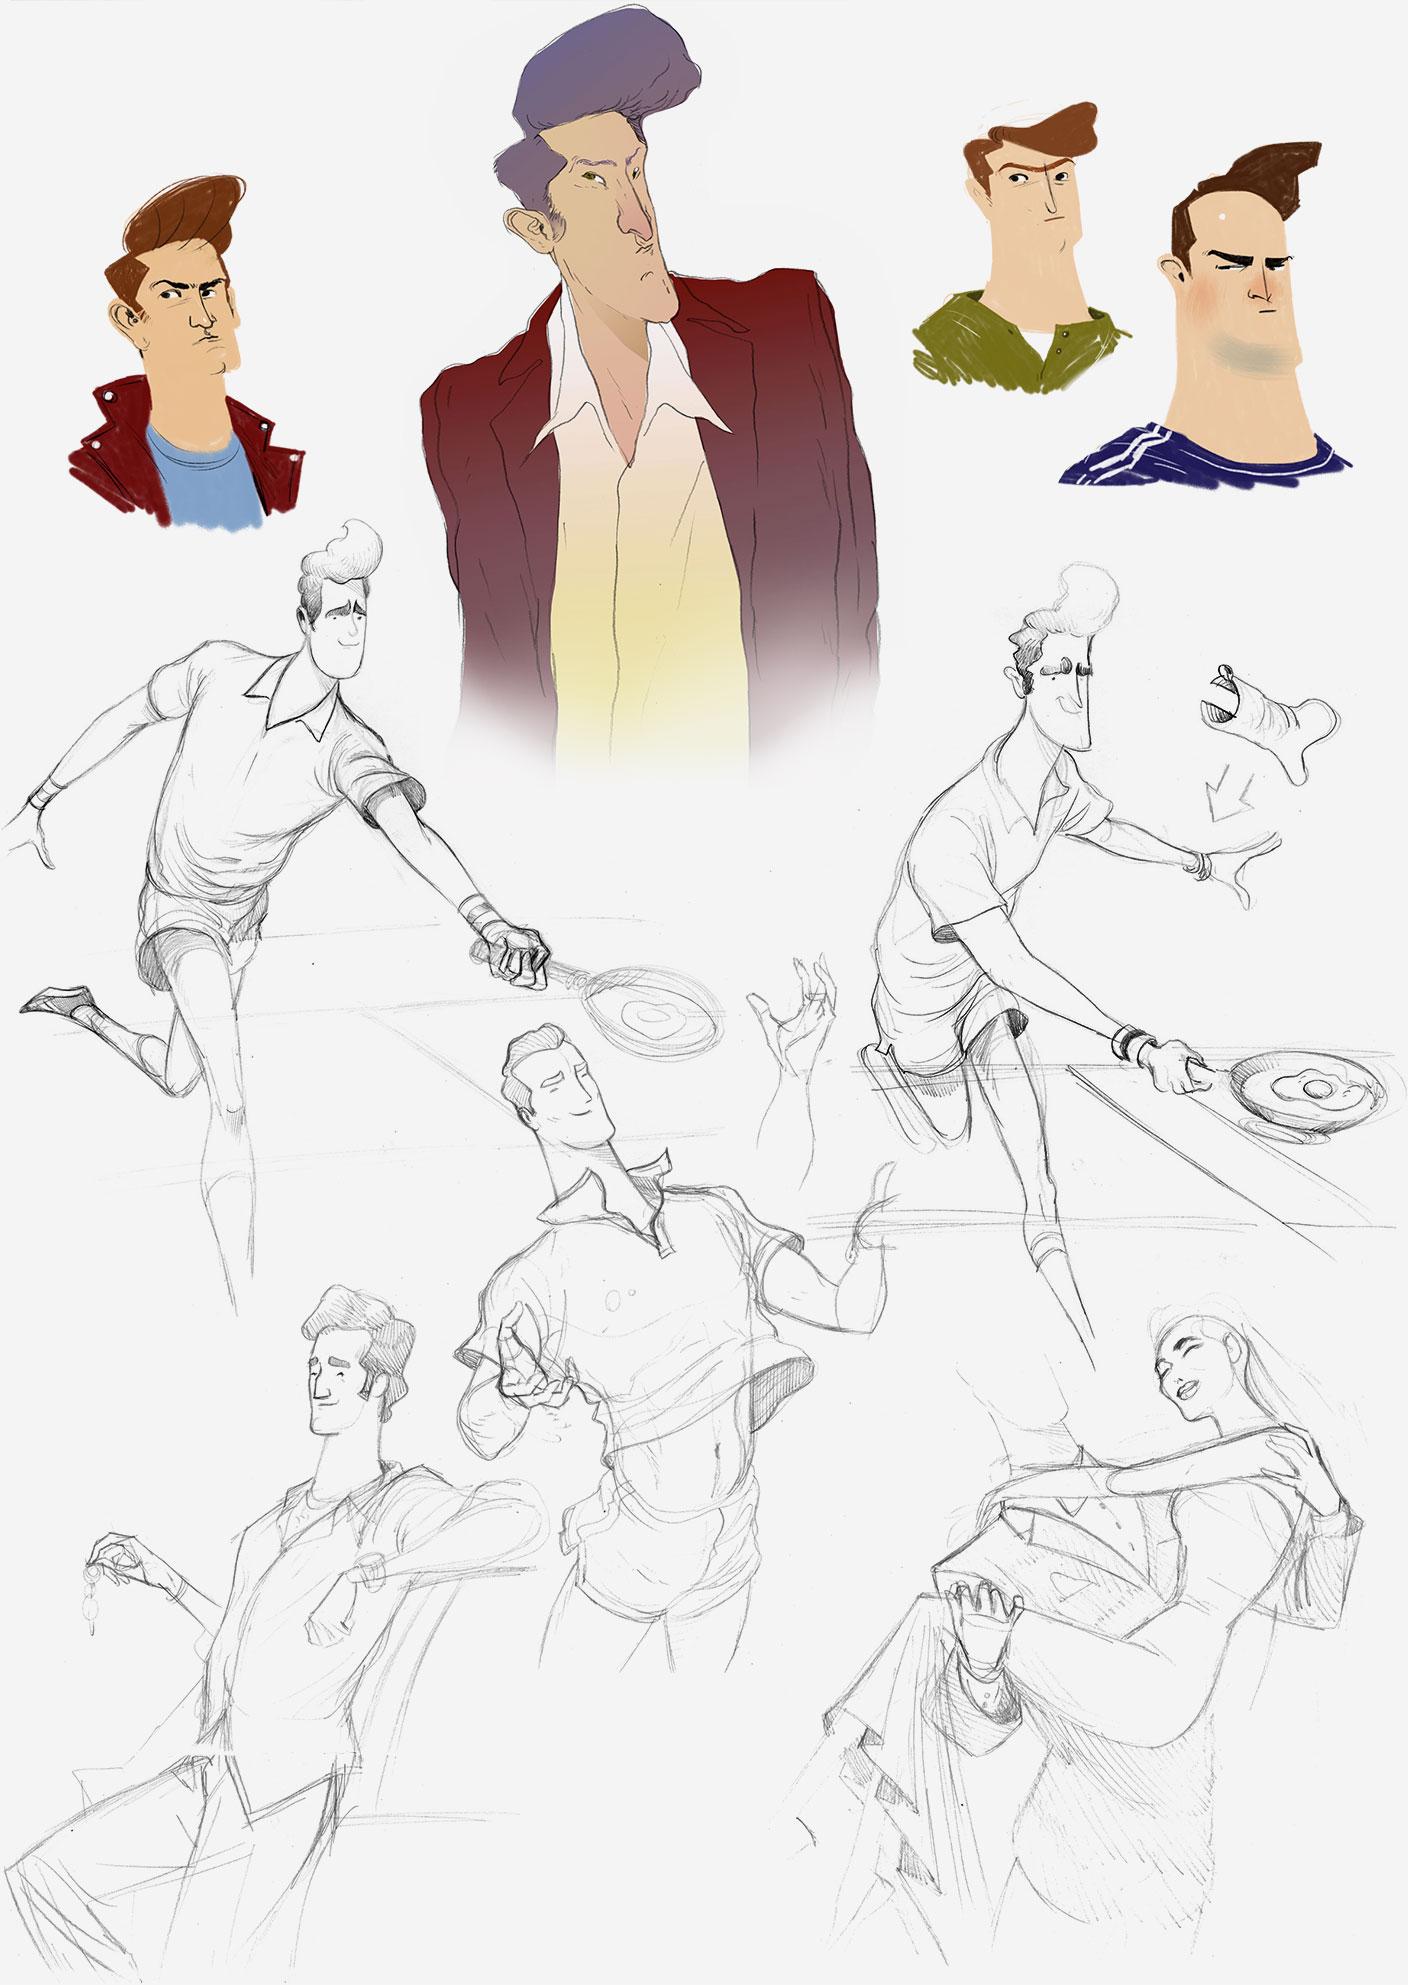 macacolandia-sketches-homens-possiveis